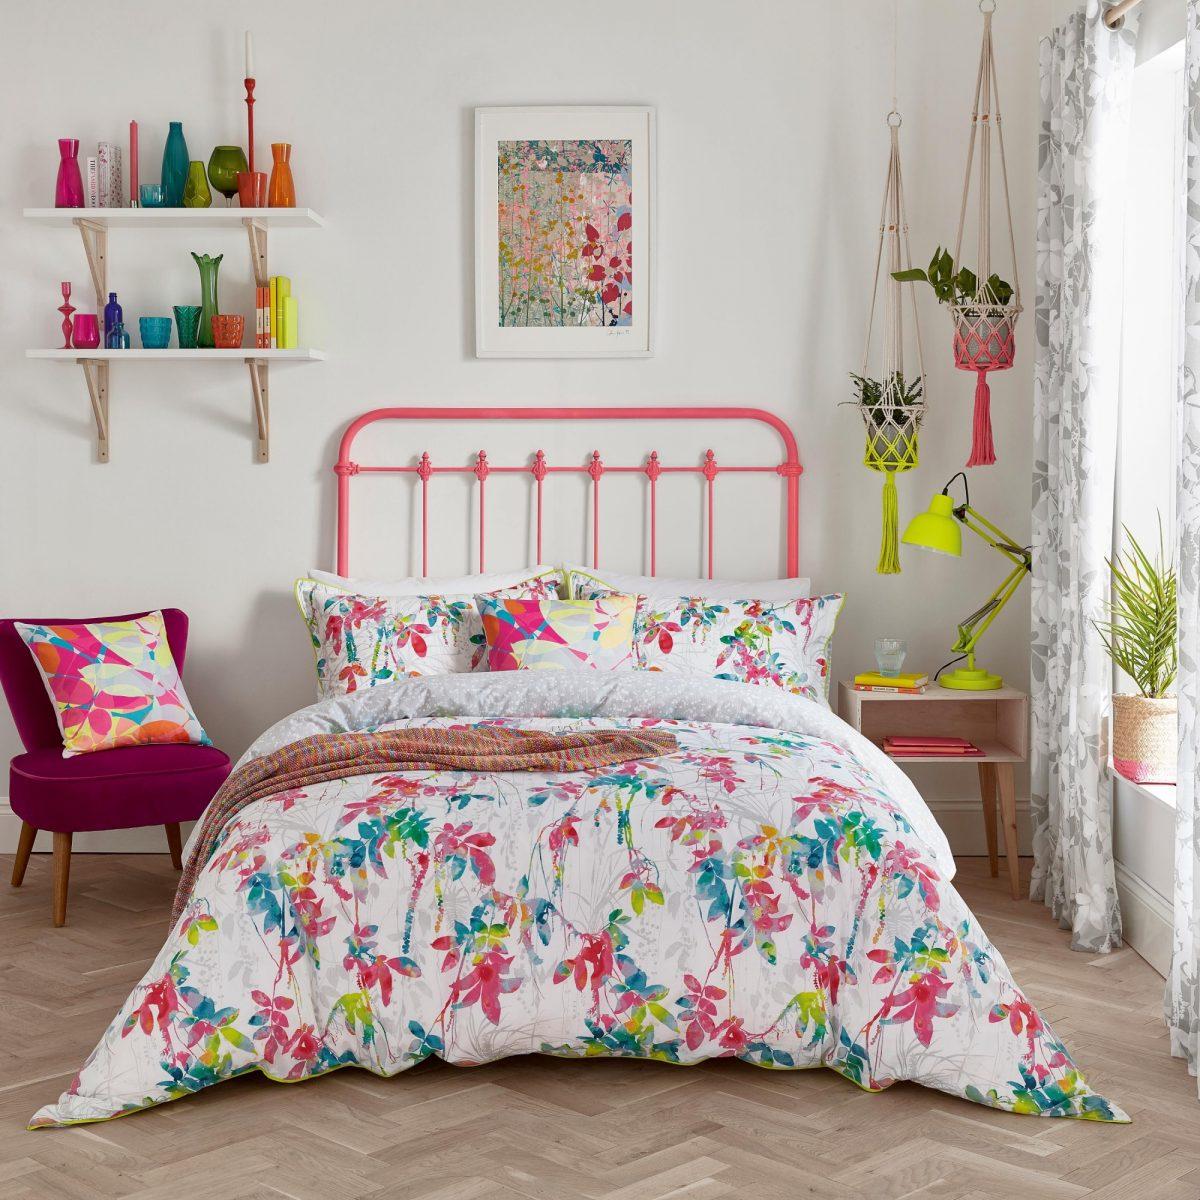 CLARISSA HULSE Jungle main bed LR